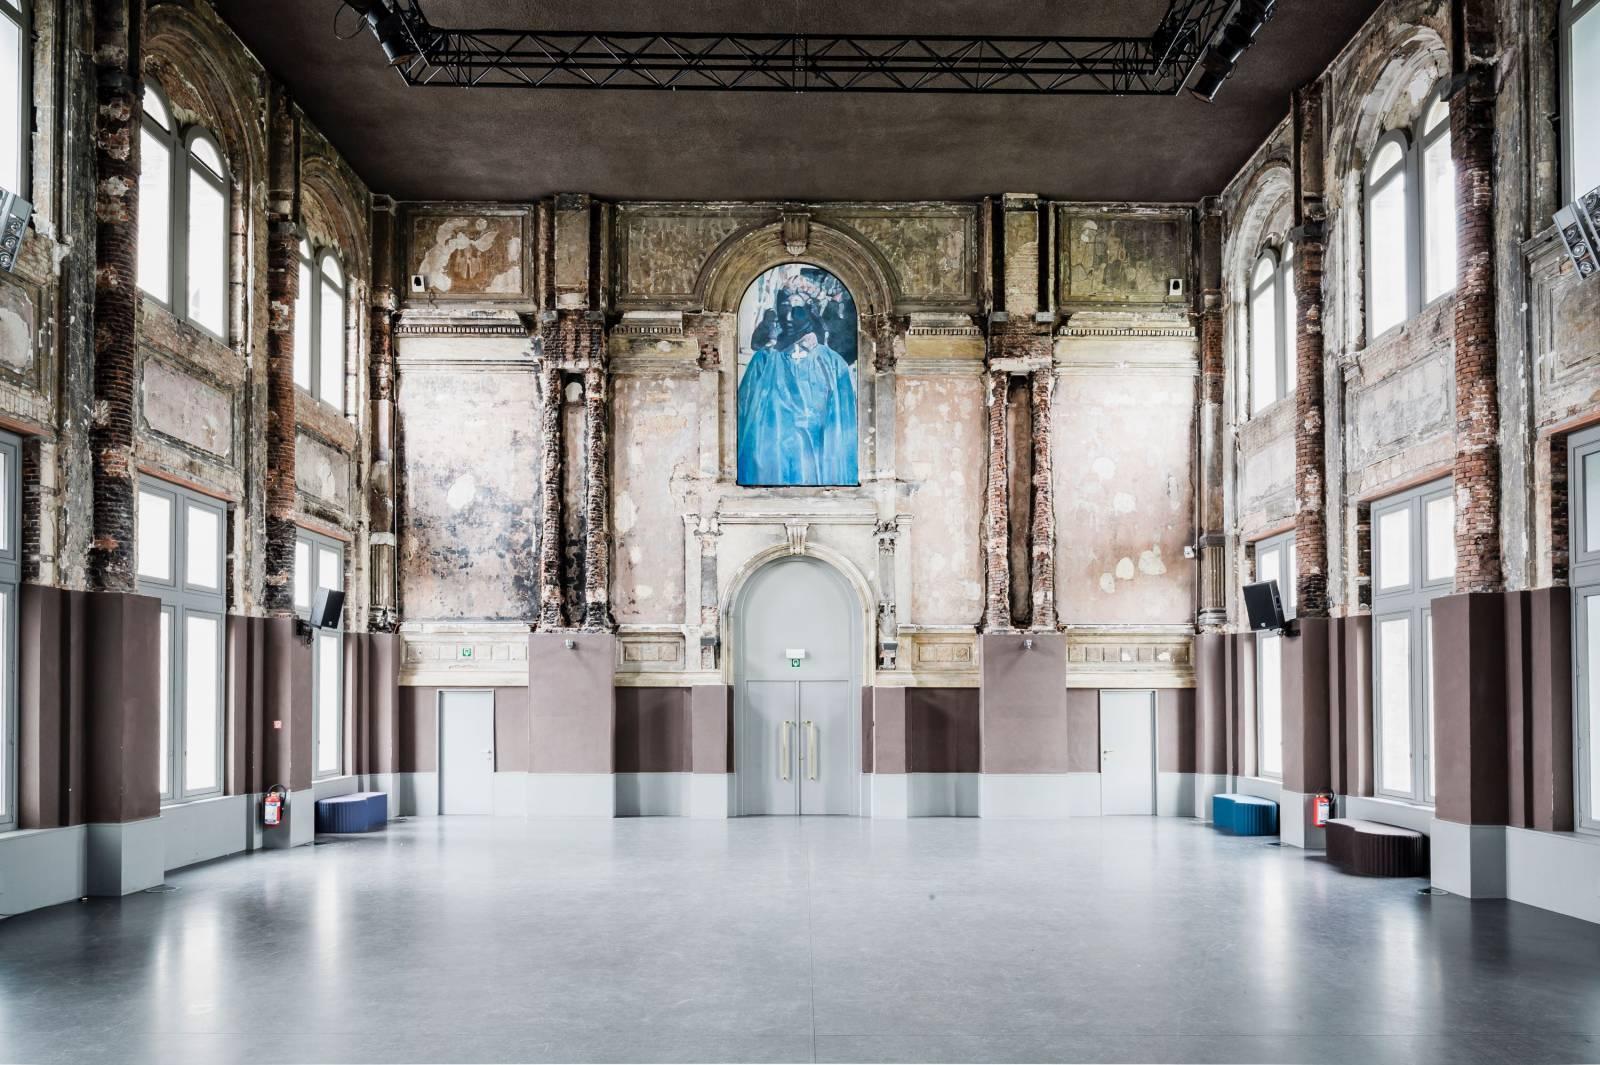 Zaal AthenA - Feestzaal - Trouwzaal - Antwerpen - House of Weddings - 7